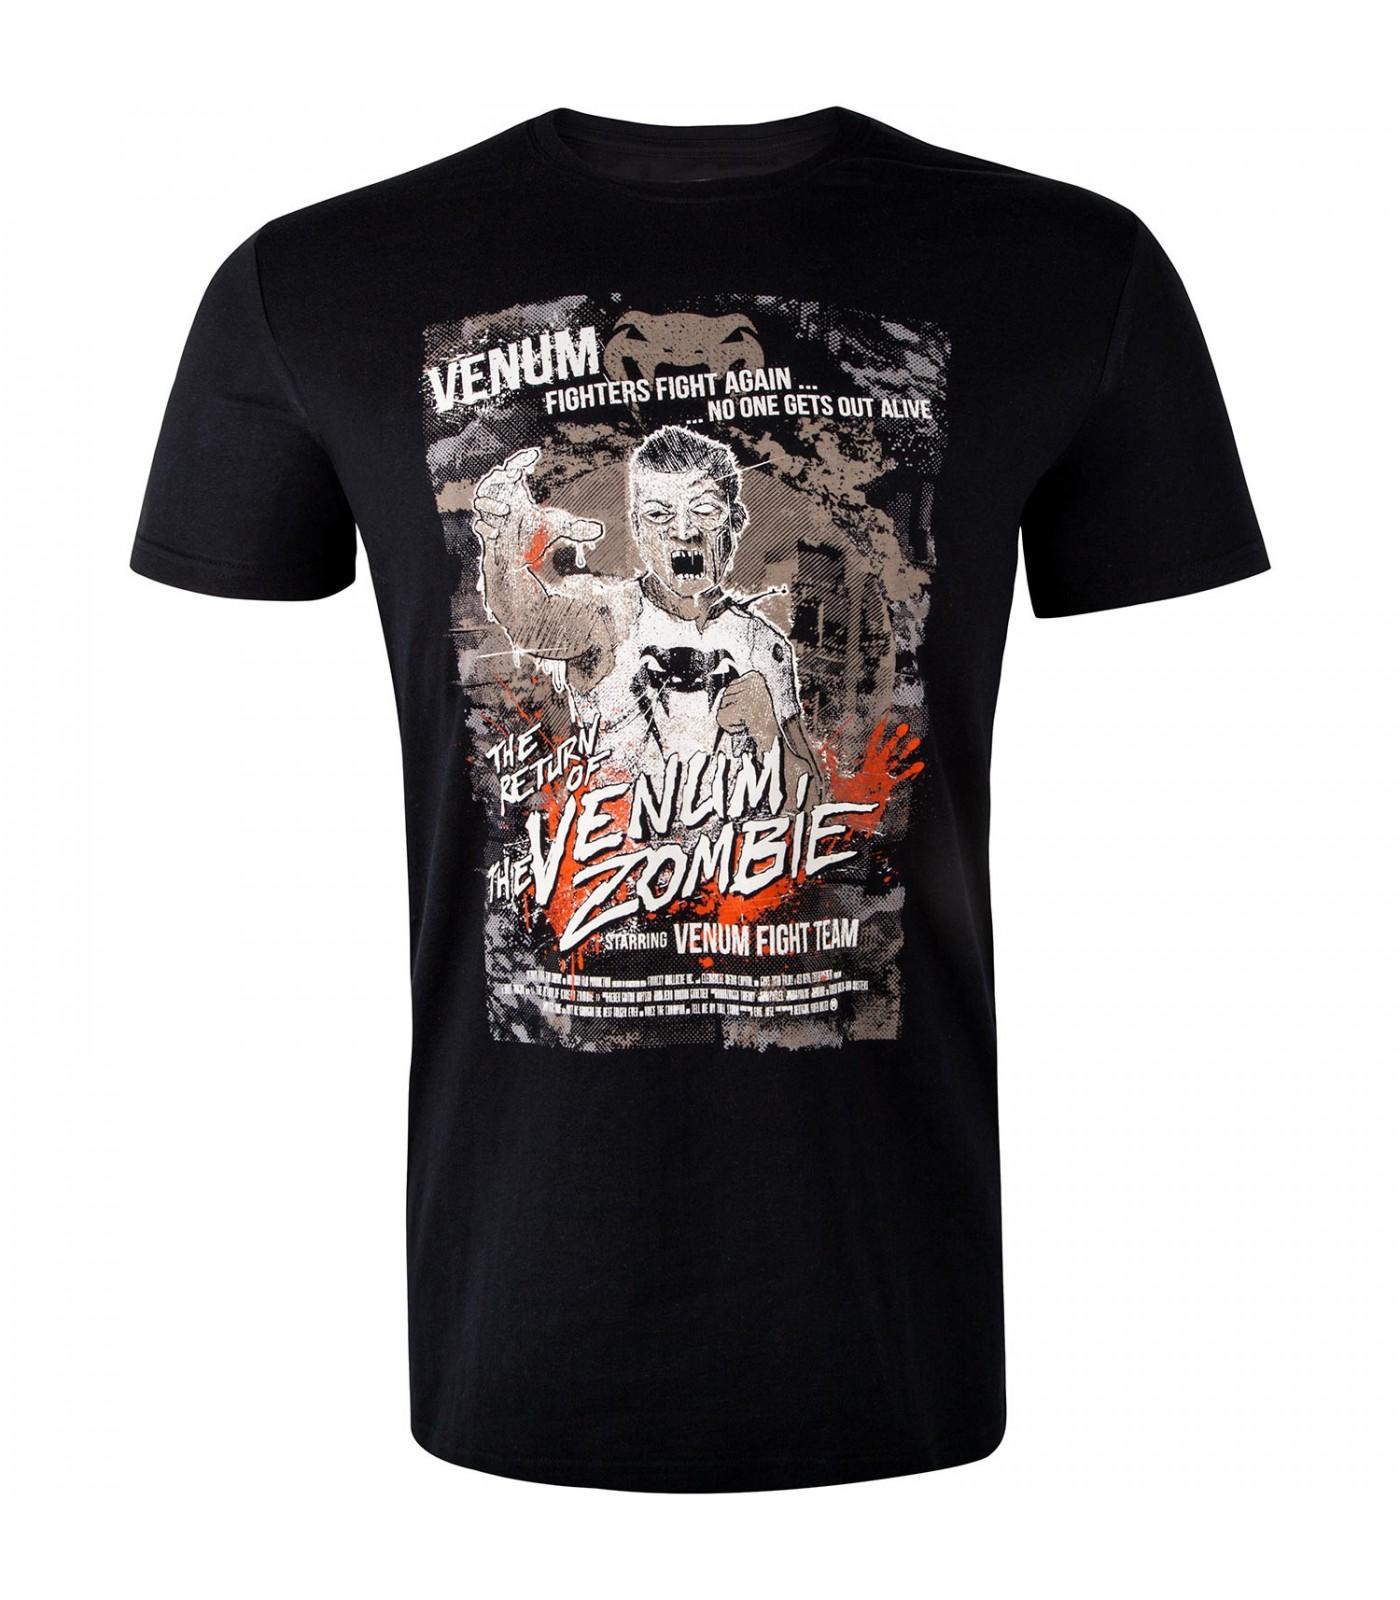 Тениска - VENUM ZOMBIE RETURN T-SHIRT - BLACK